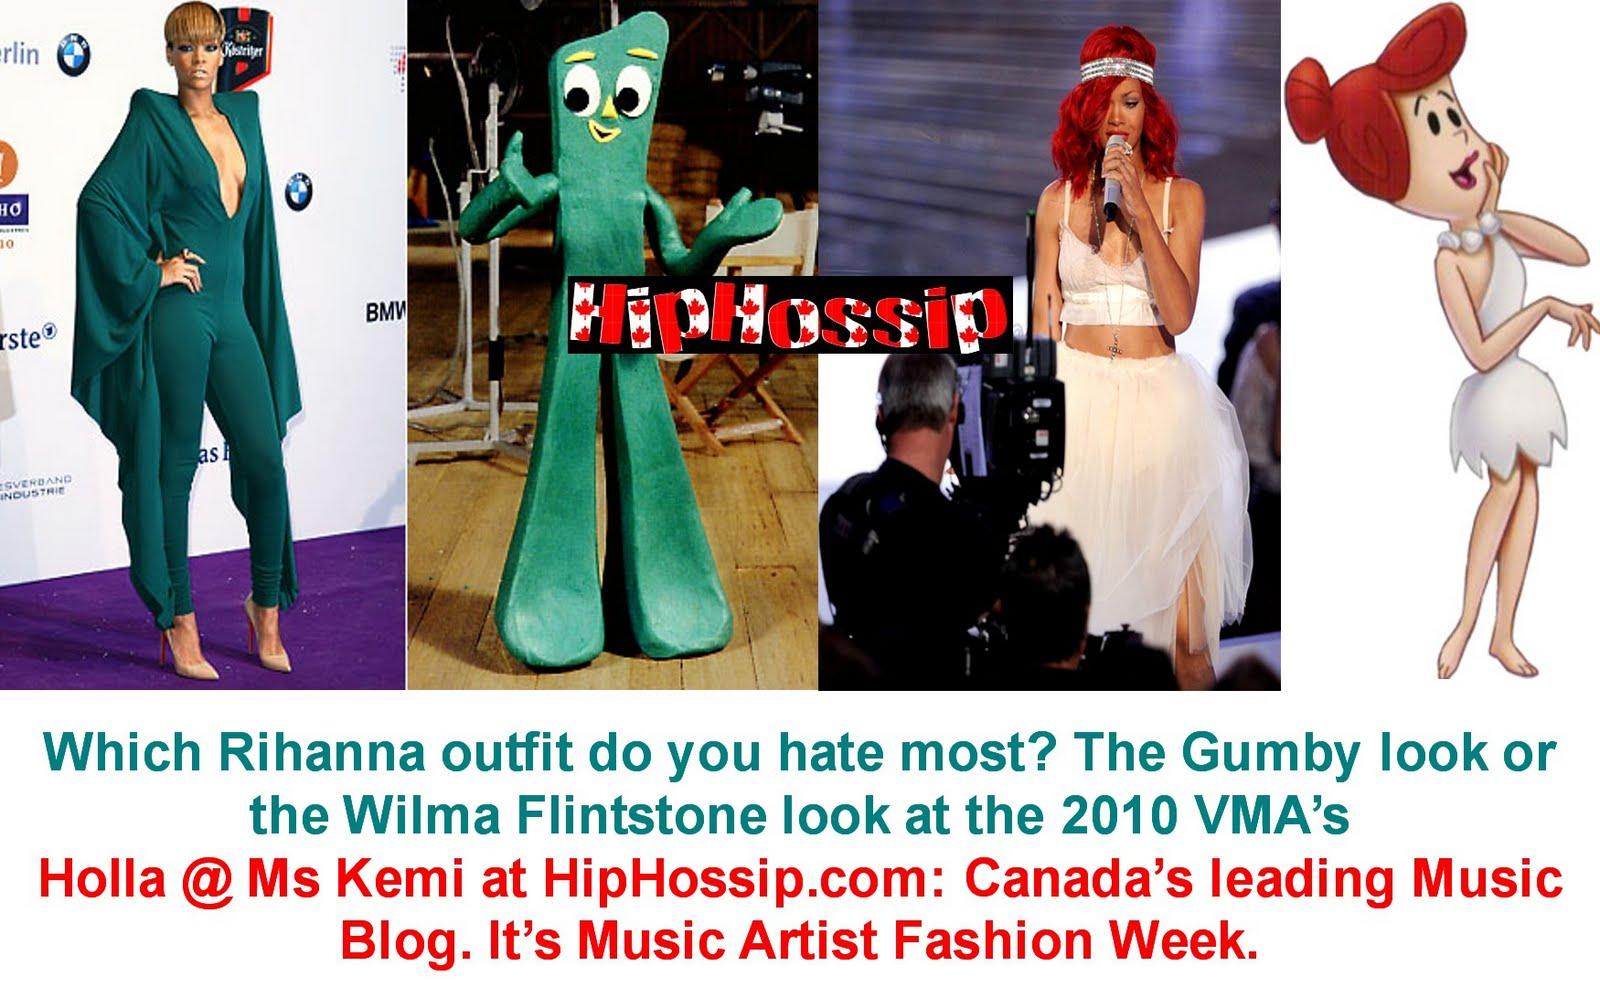 http://3.bp.blogspot.com/_GdNL2BdQnwo/TJ-VkvBLUwI/AAAAAAAAflw/o2Wi_kERIq8/s1600/Rihanna+weird+fashions.jpg